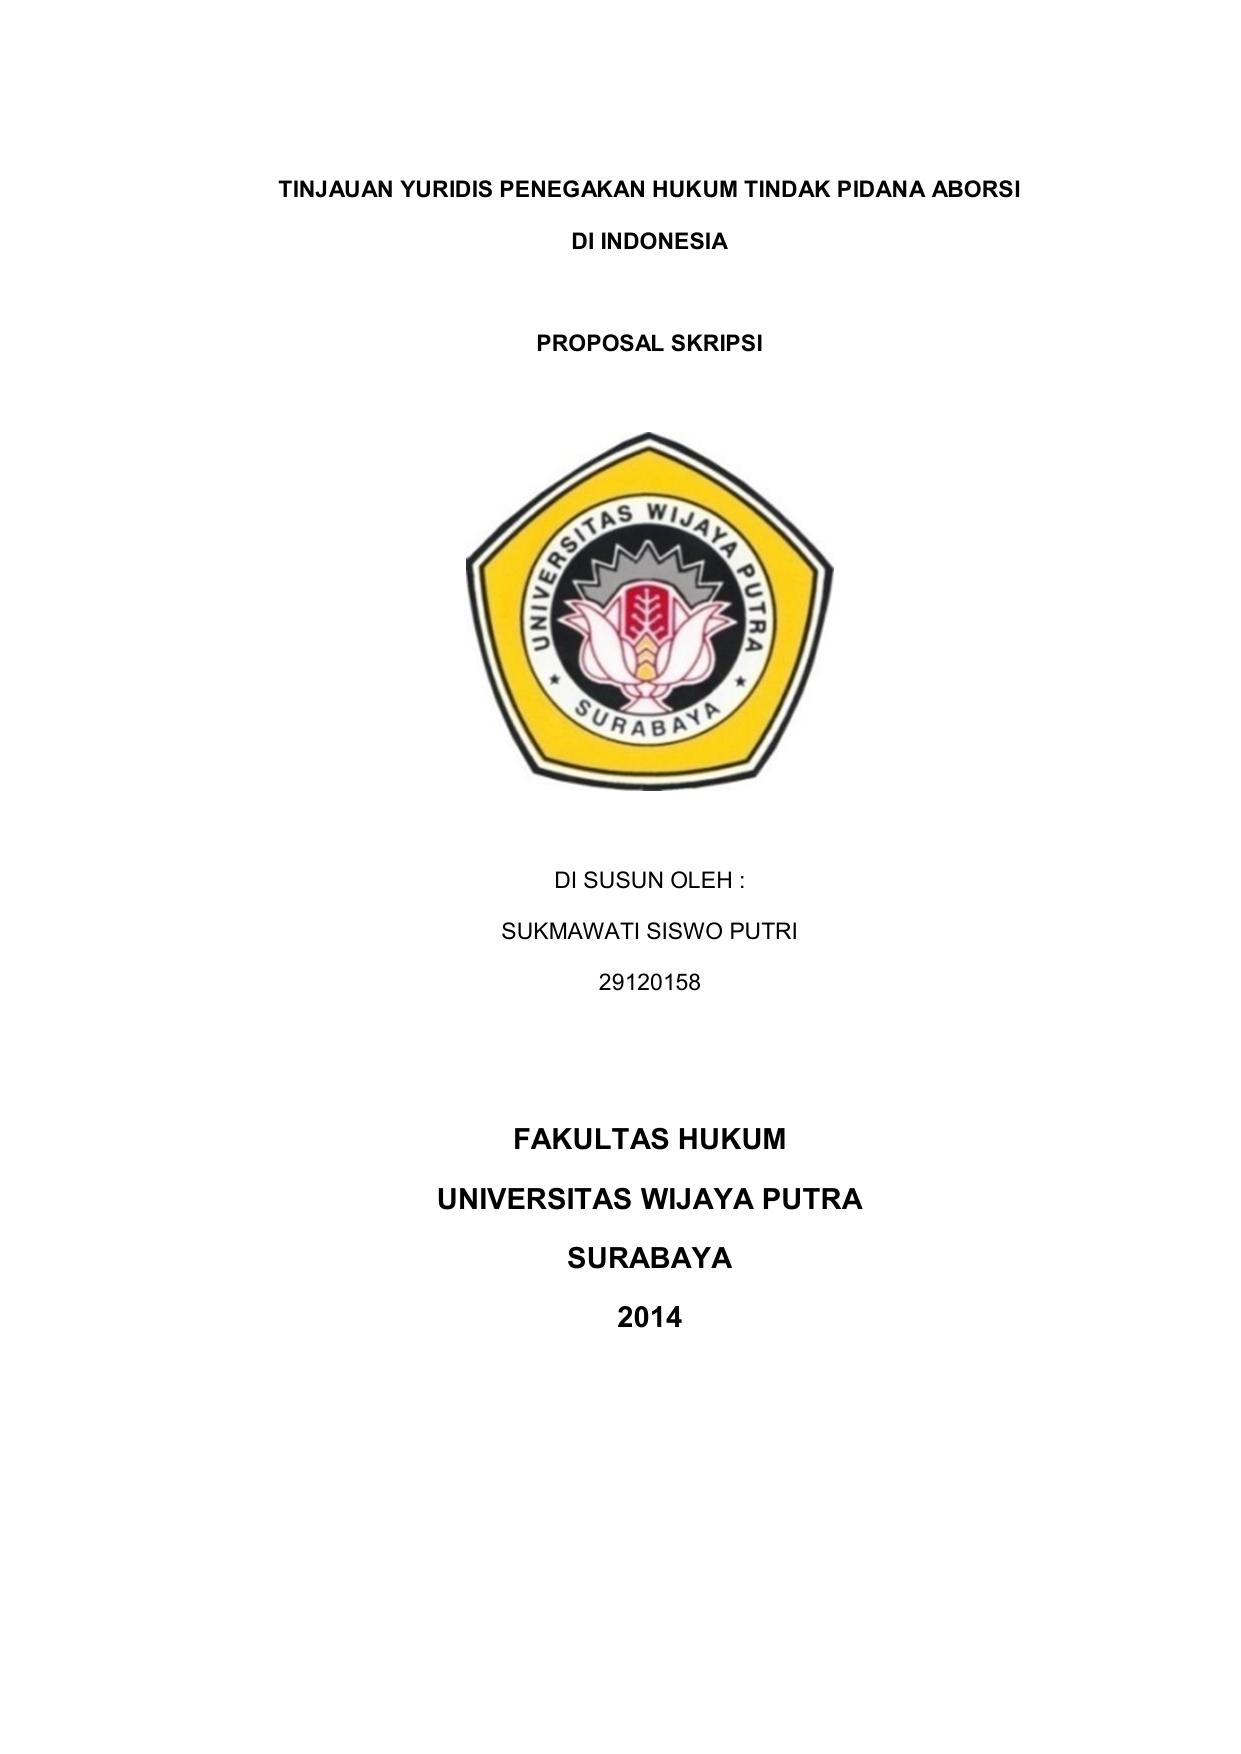 Fakultas Hukum Universitas Wijaya Putra Surabaya 2014